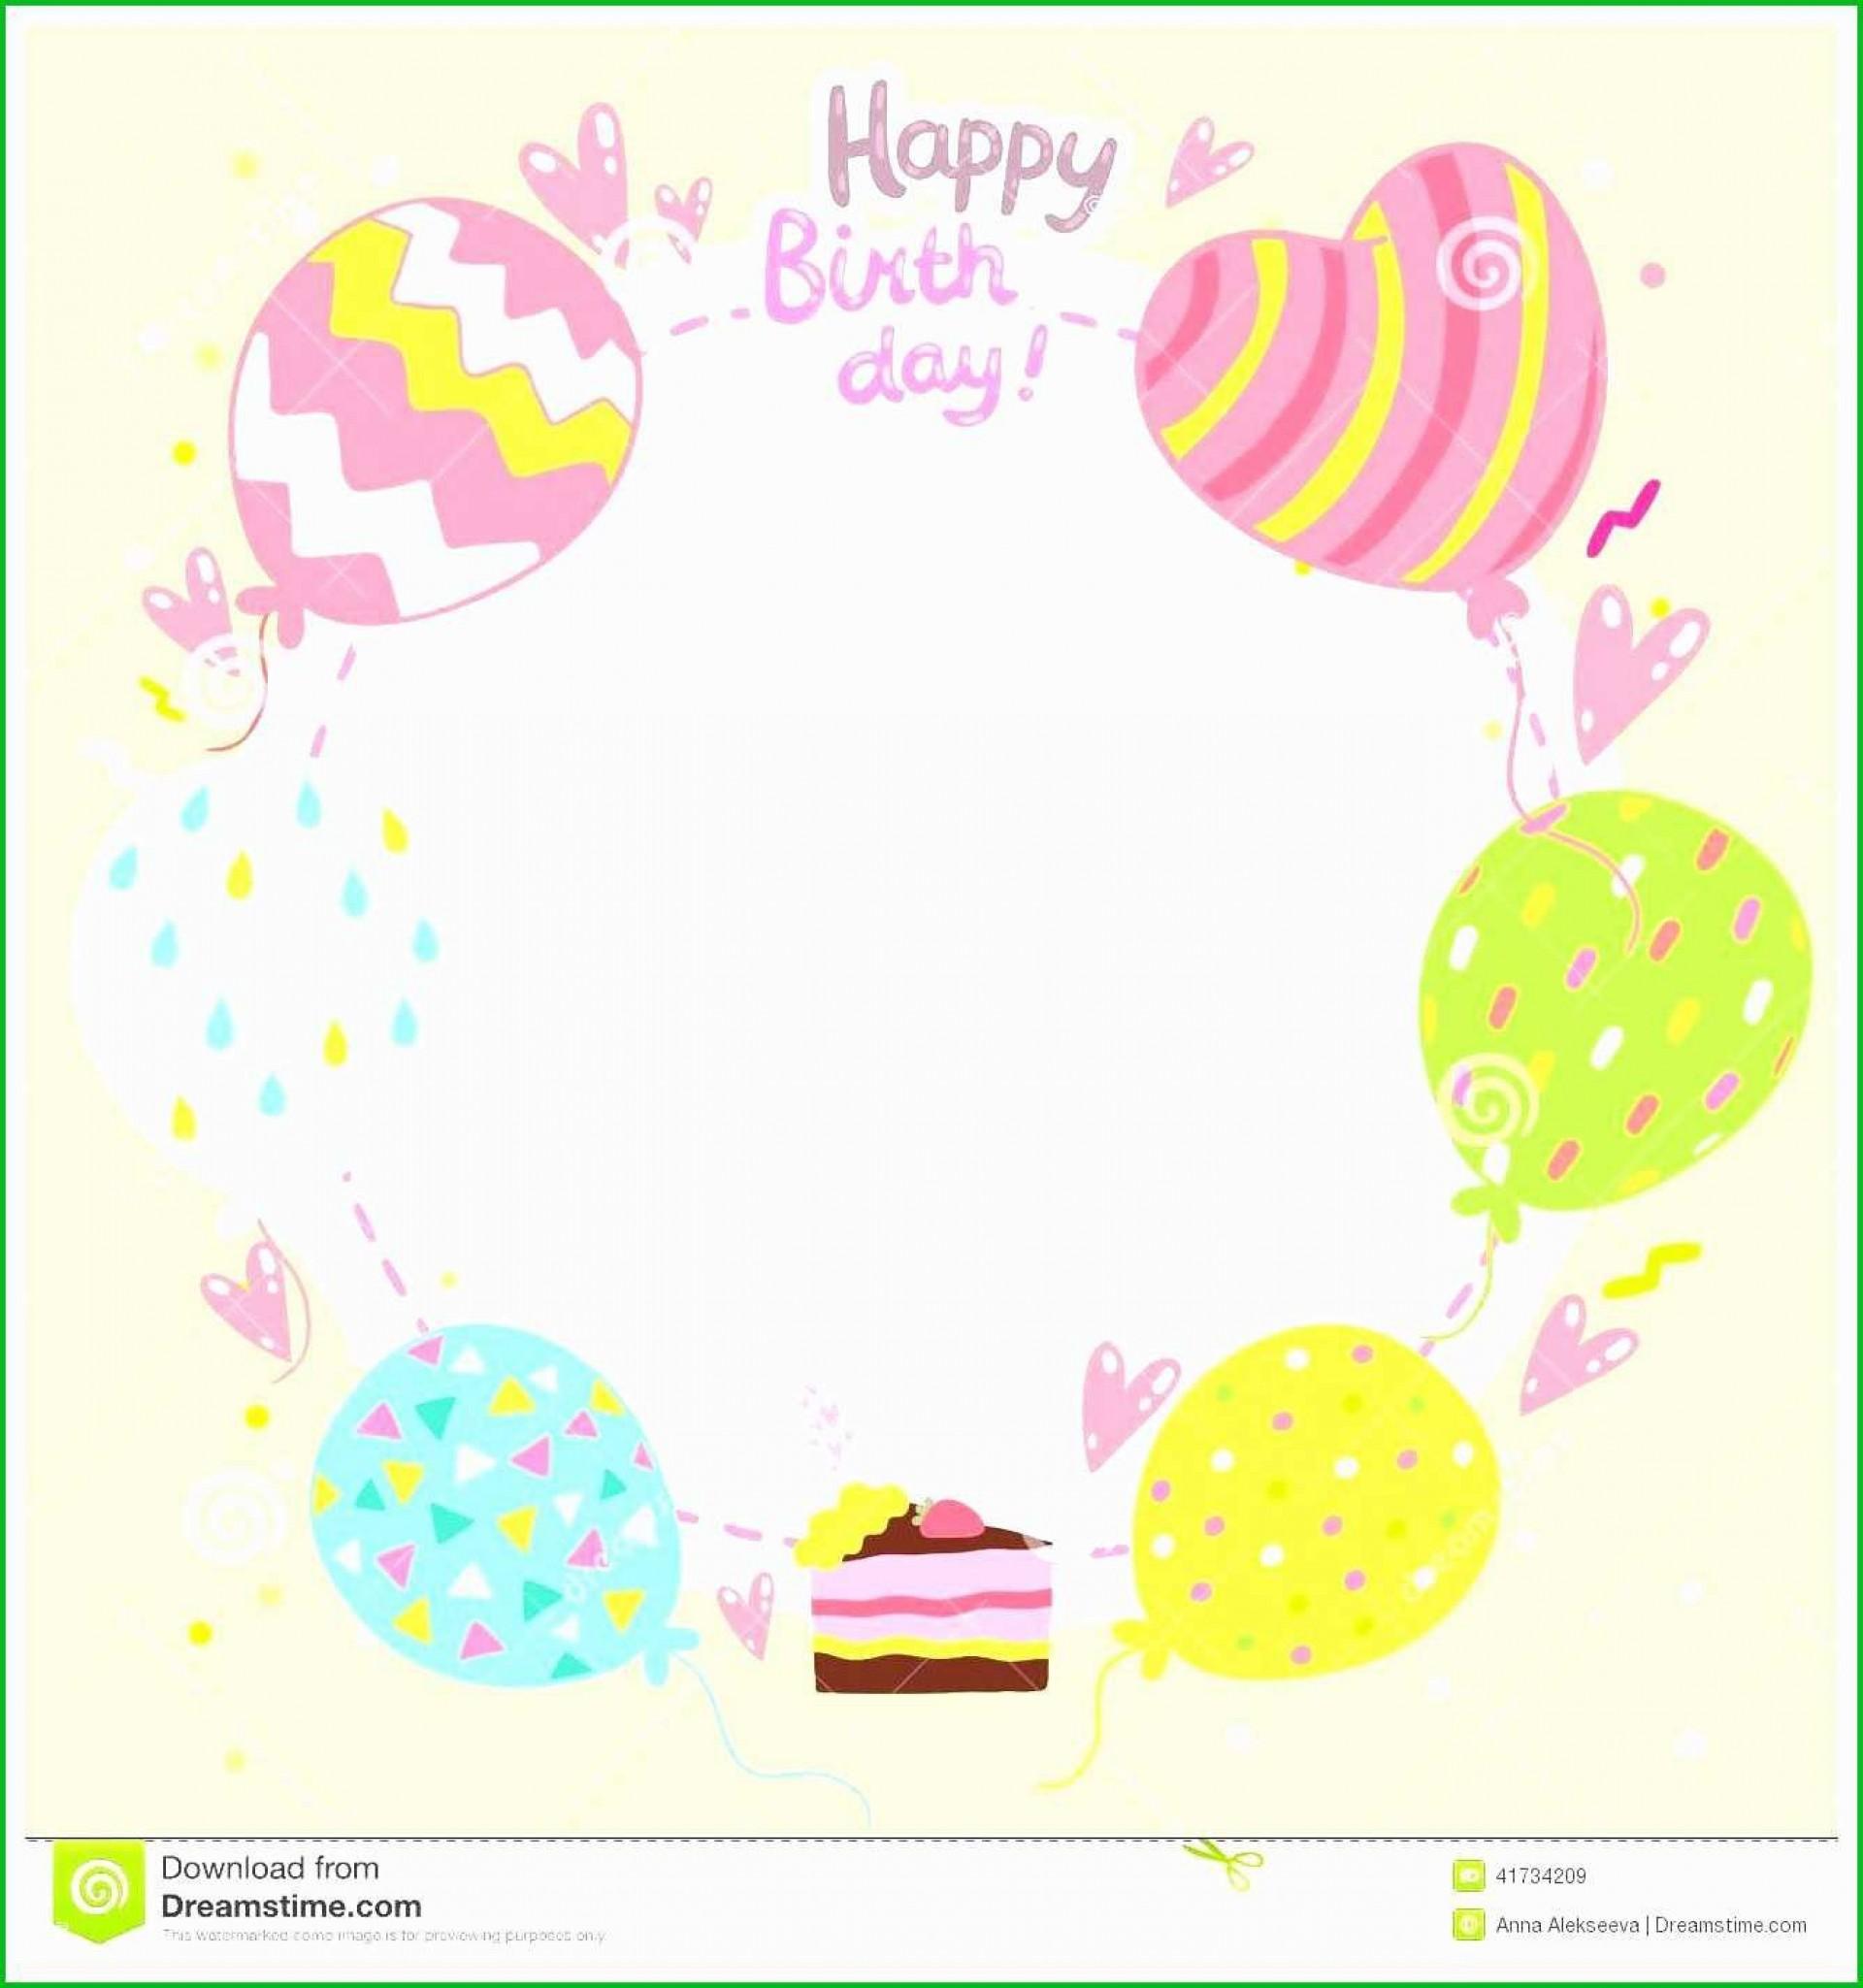 003 Unforgettable Birthday Card Template Free Photo  Invitation Photoshop Download Word1920